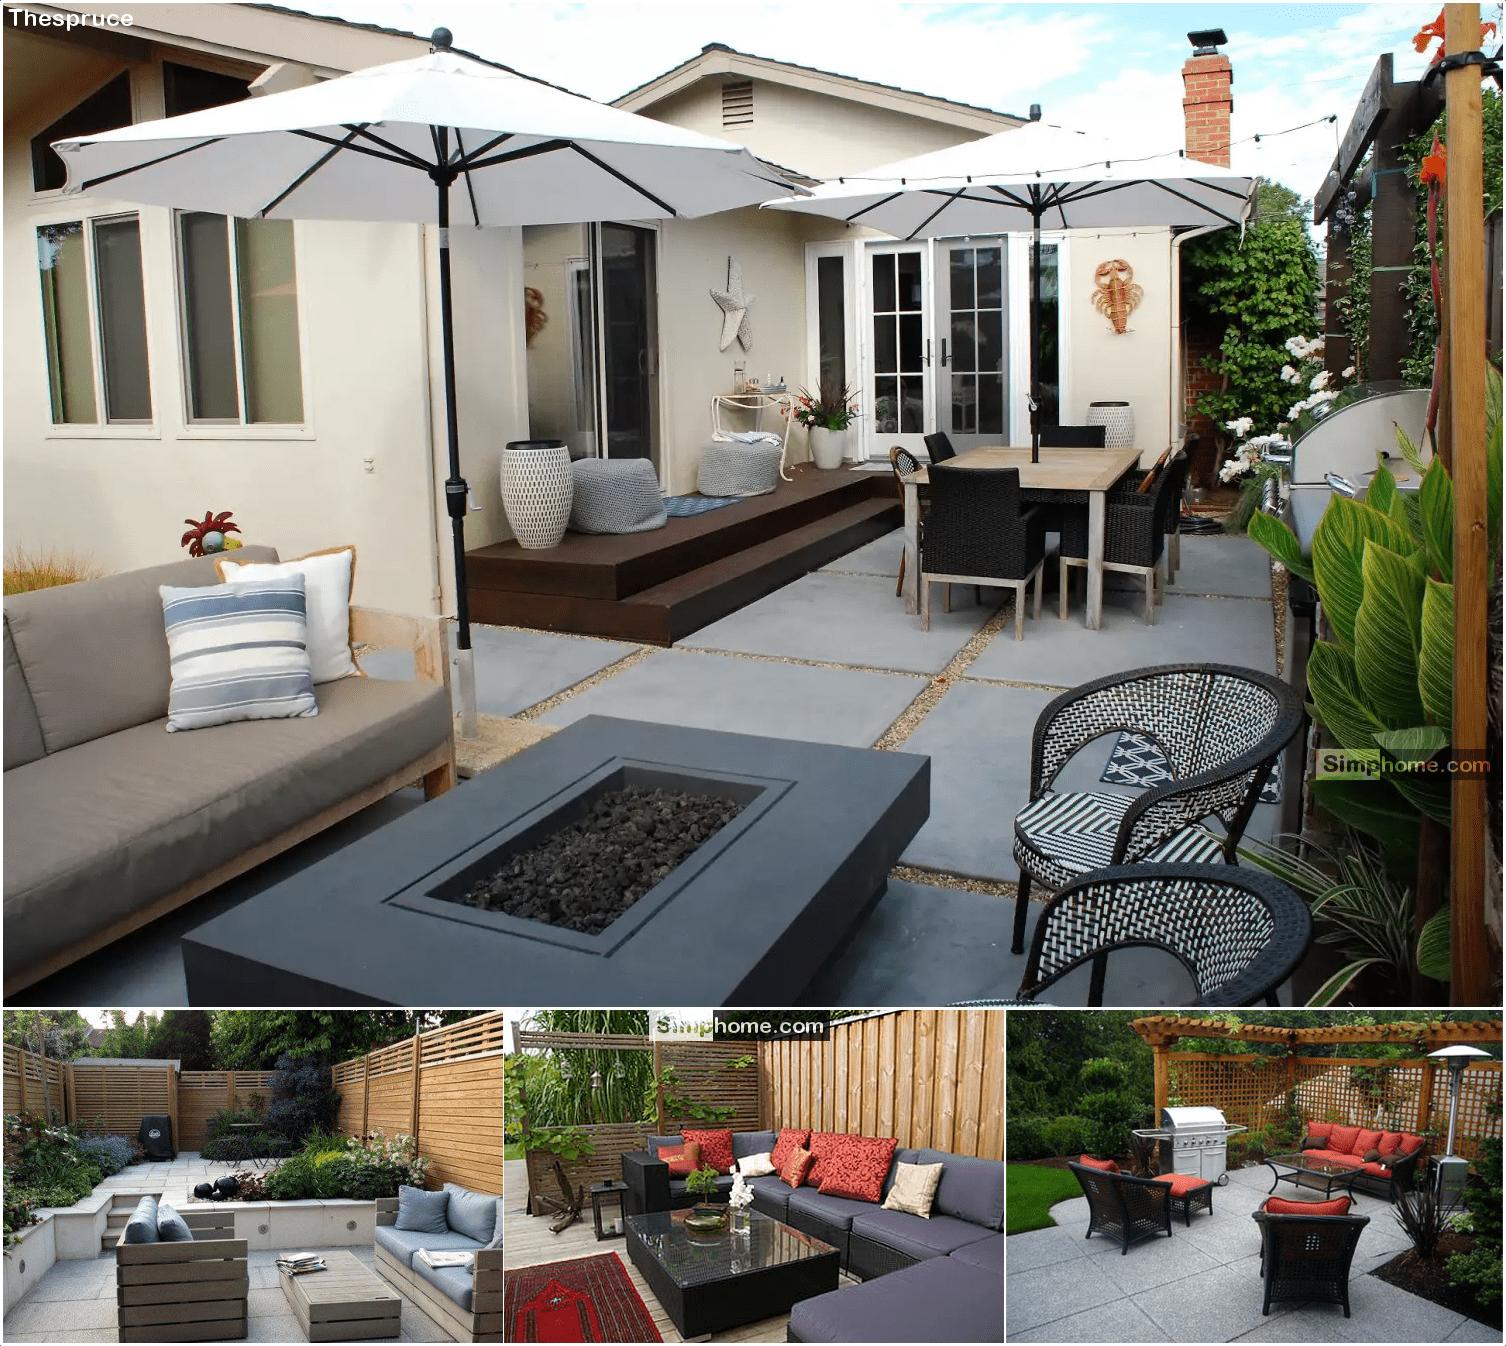 1.Stylish and Low Maintenance backyard Landscaping Ideas via Simphome.com